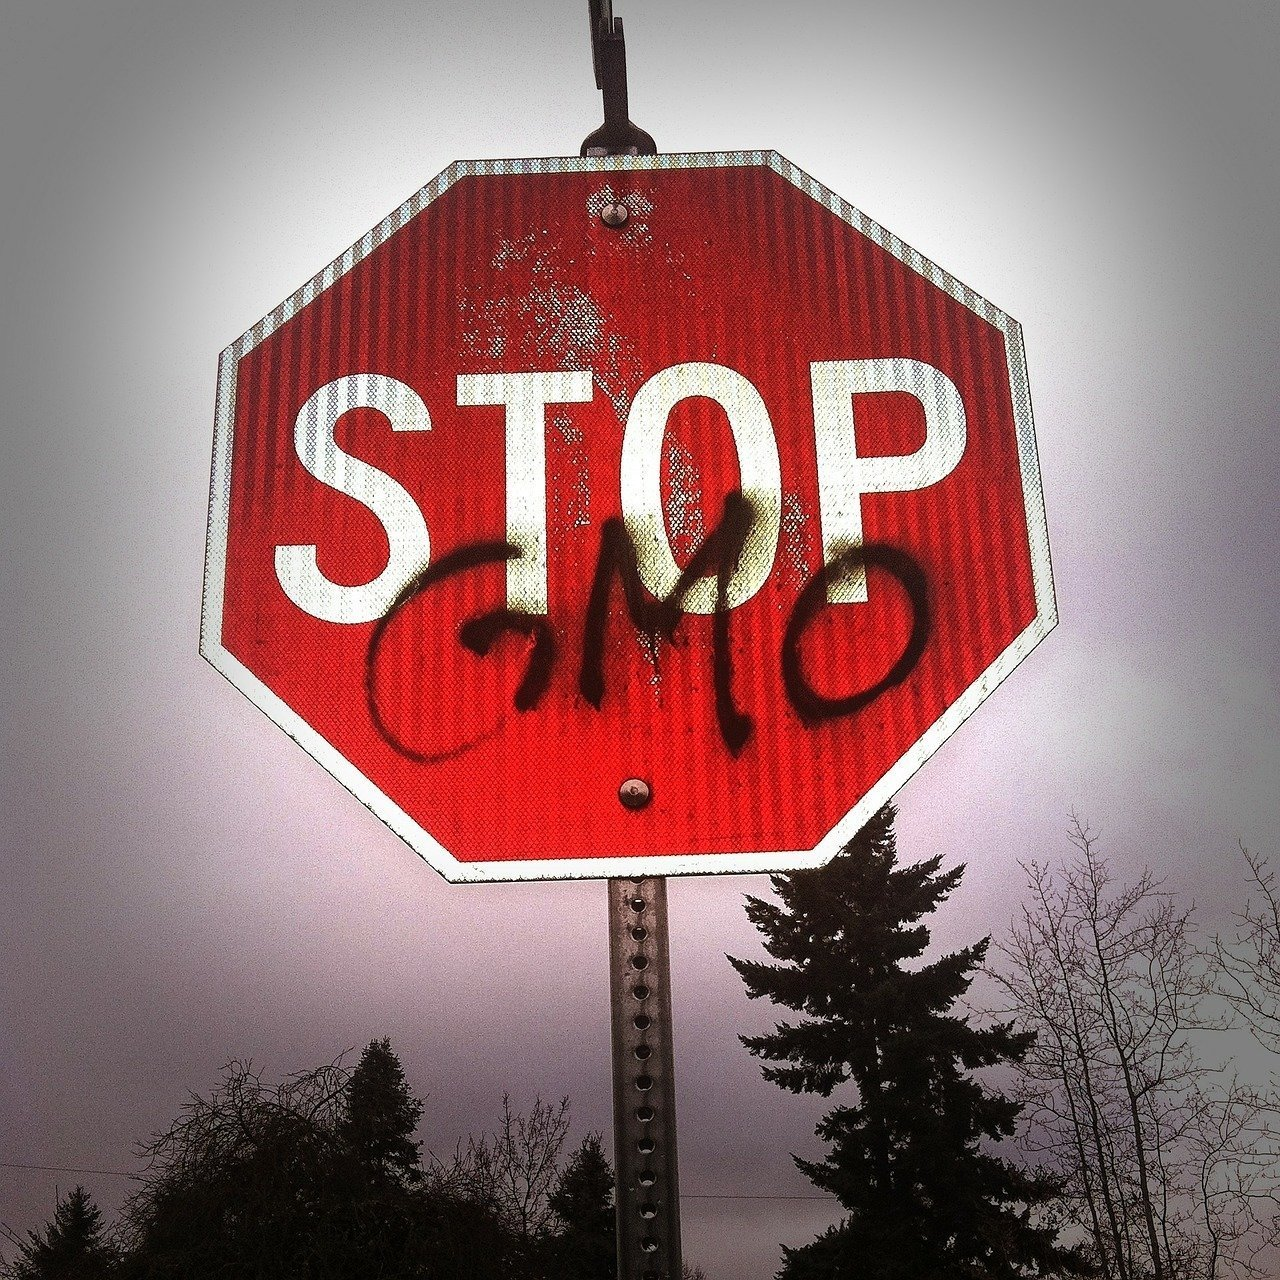 Hungary to produce GMO-free milk, meat, eggs